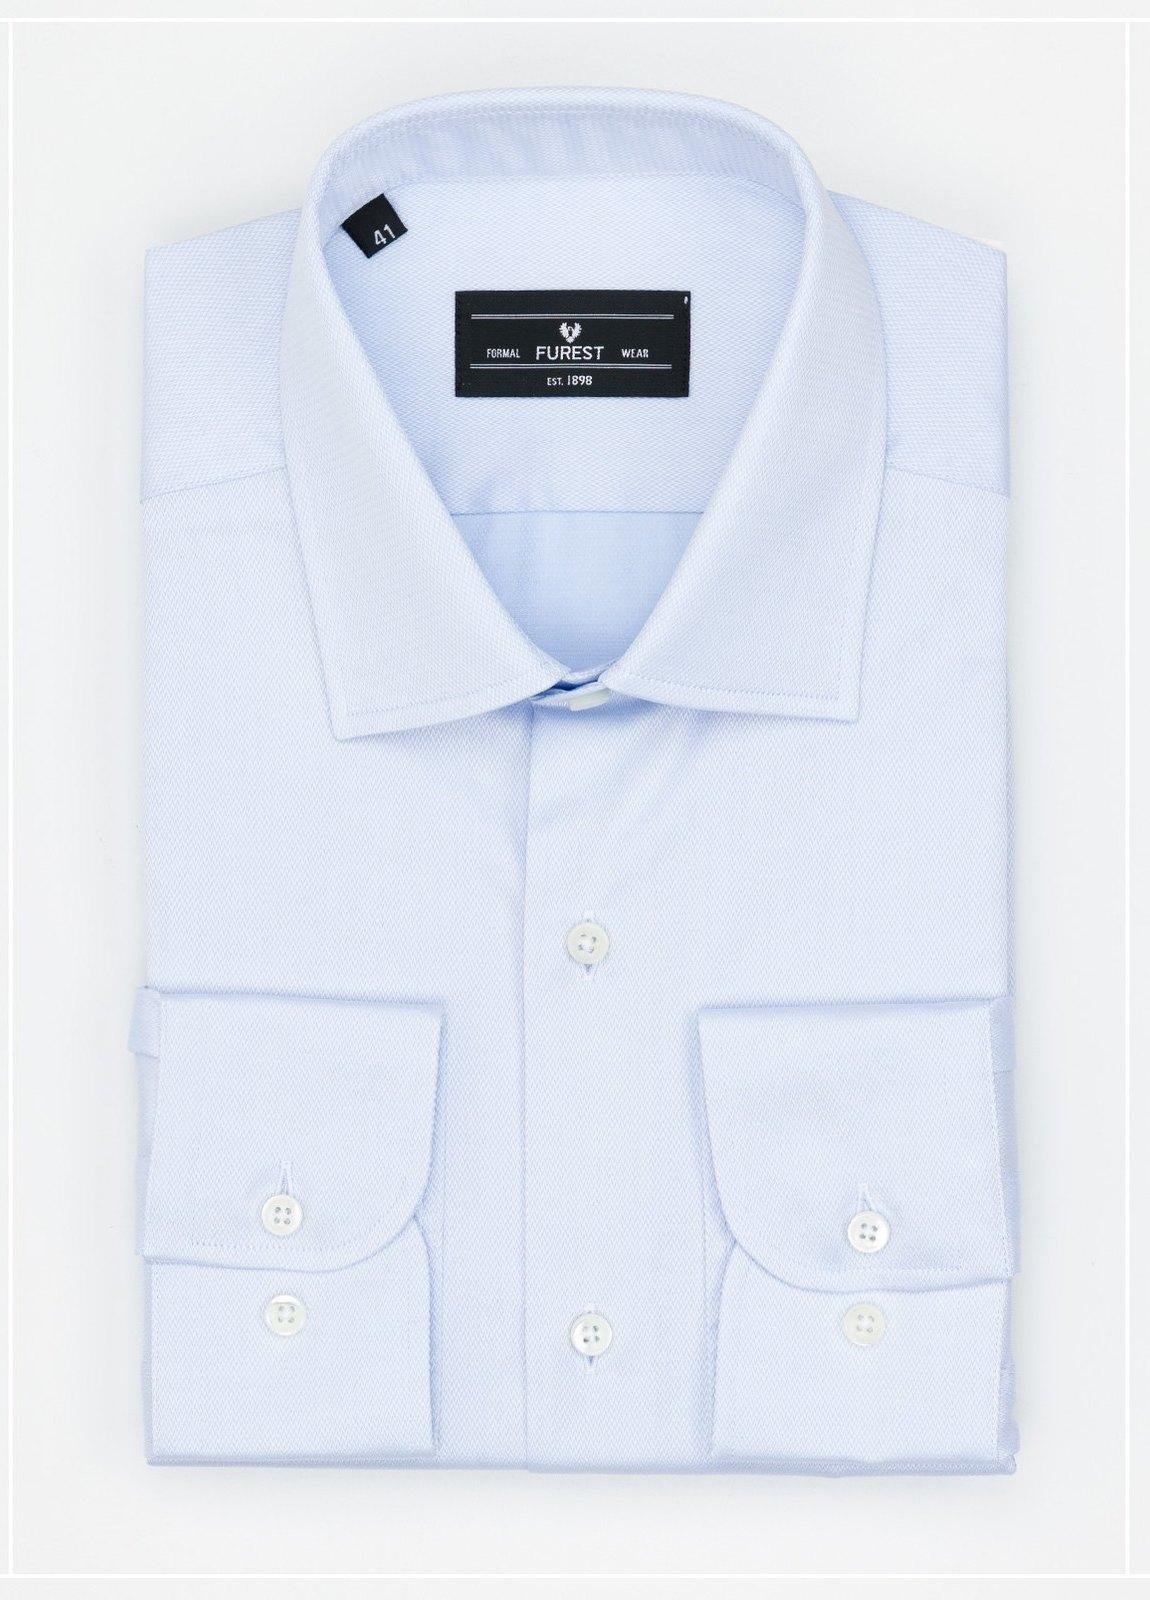 Camisa Formal Wear SLIM FIT cuello italiano modelo ROMA microtextura color celeste, 100% Algodón.